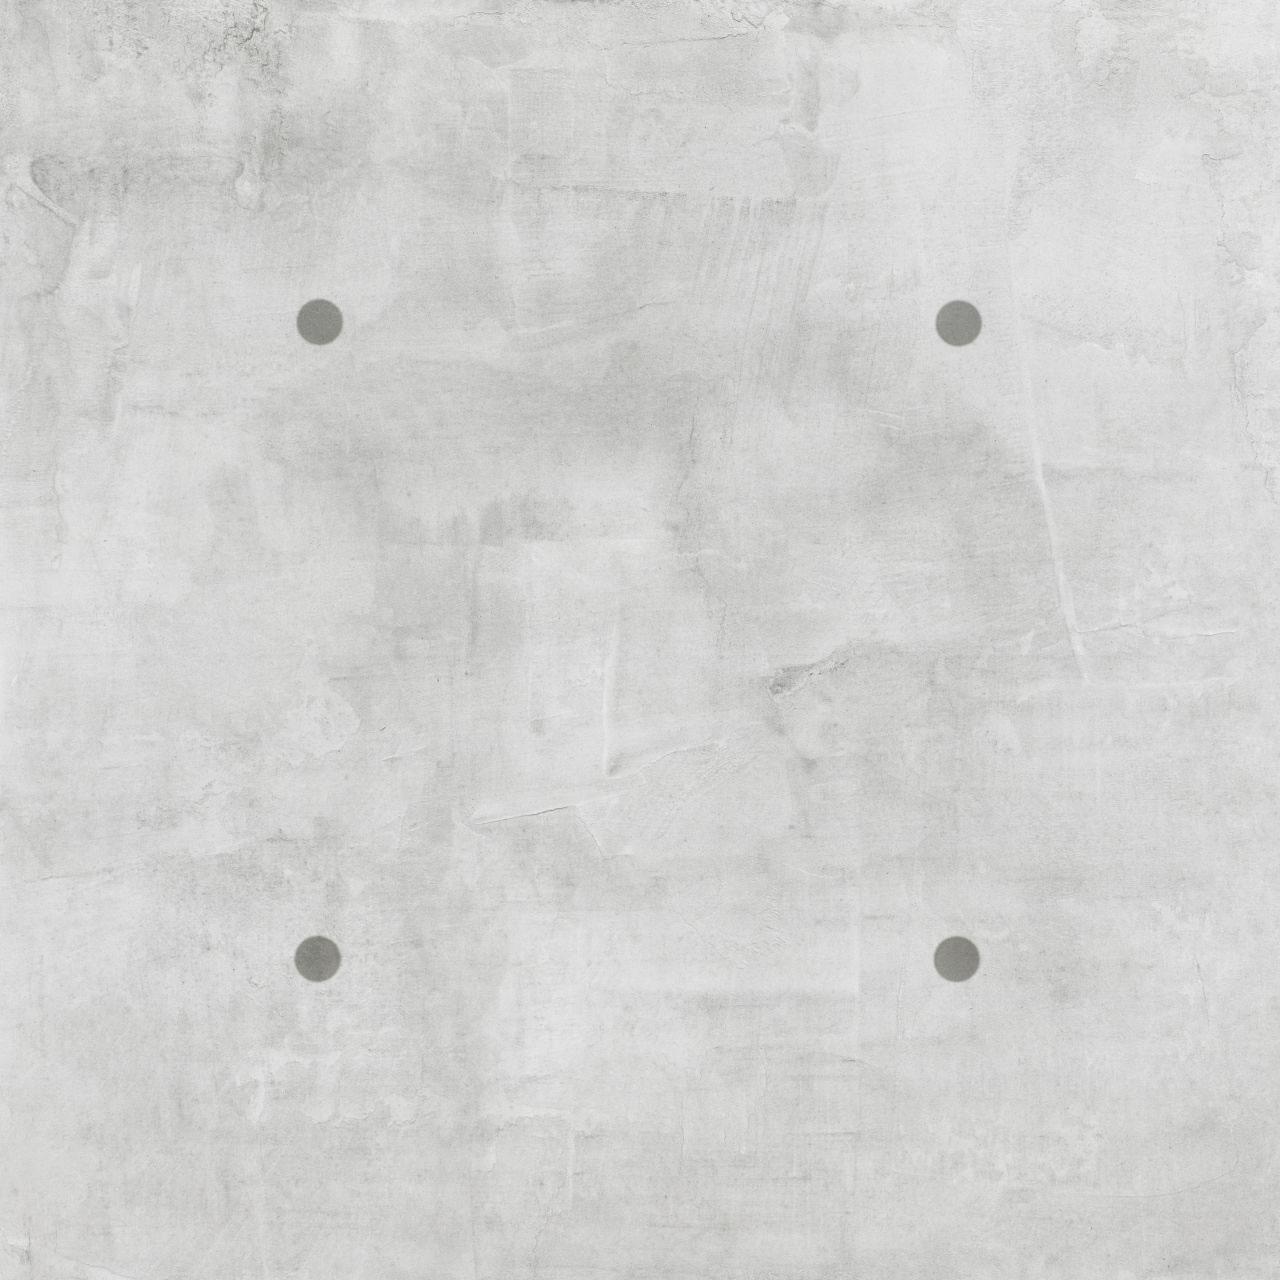 matriz concreto ma